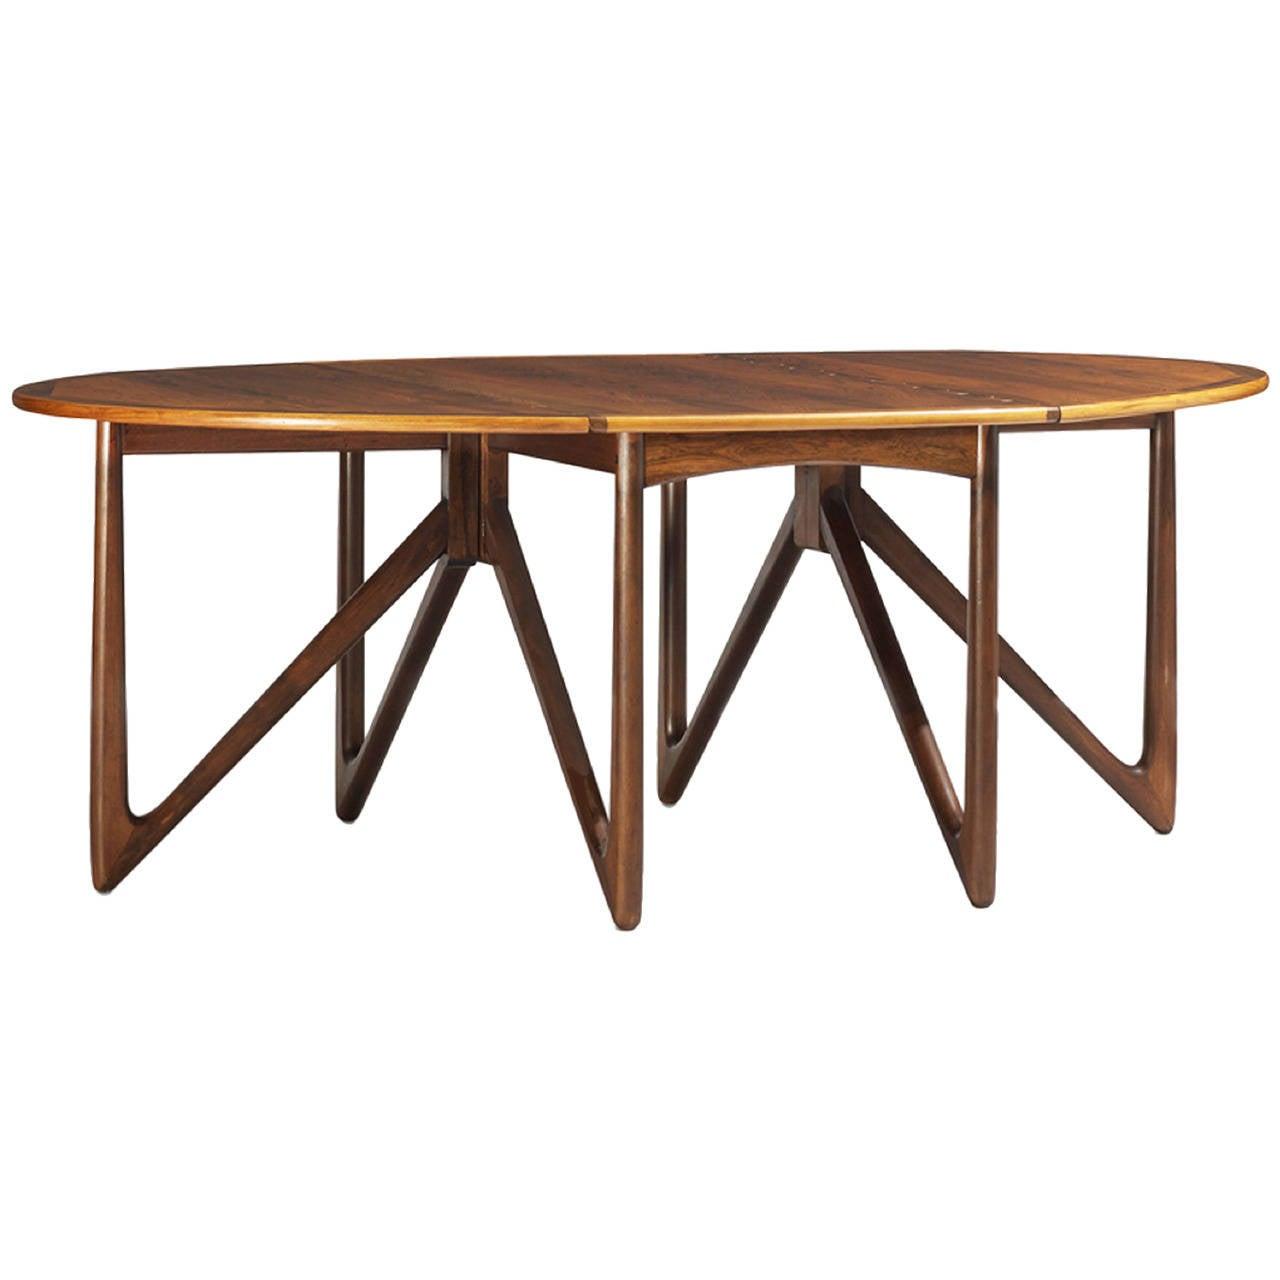 Impressive Rosewood Adjustable Dining Table Mod Drop Leaf  : 1603772l from www.1stdibs.com size 1280 x 1280 jpeg 69kB